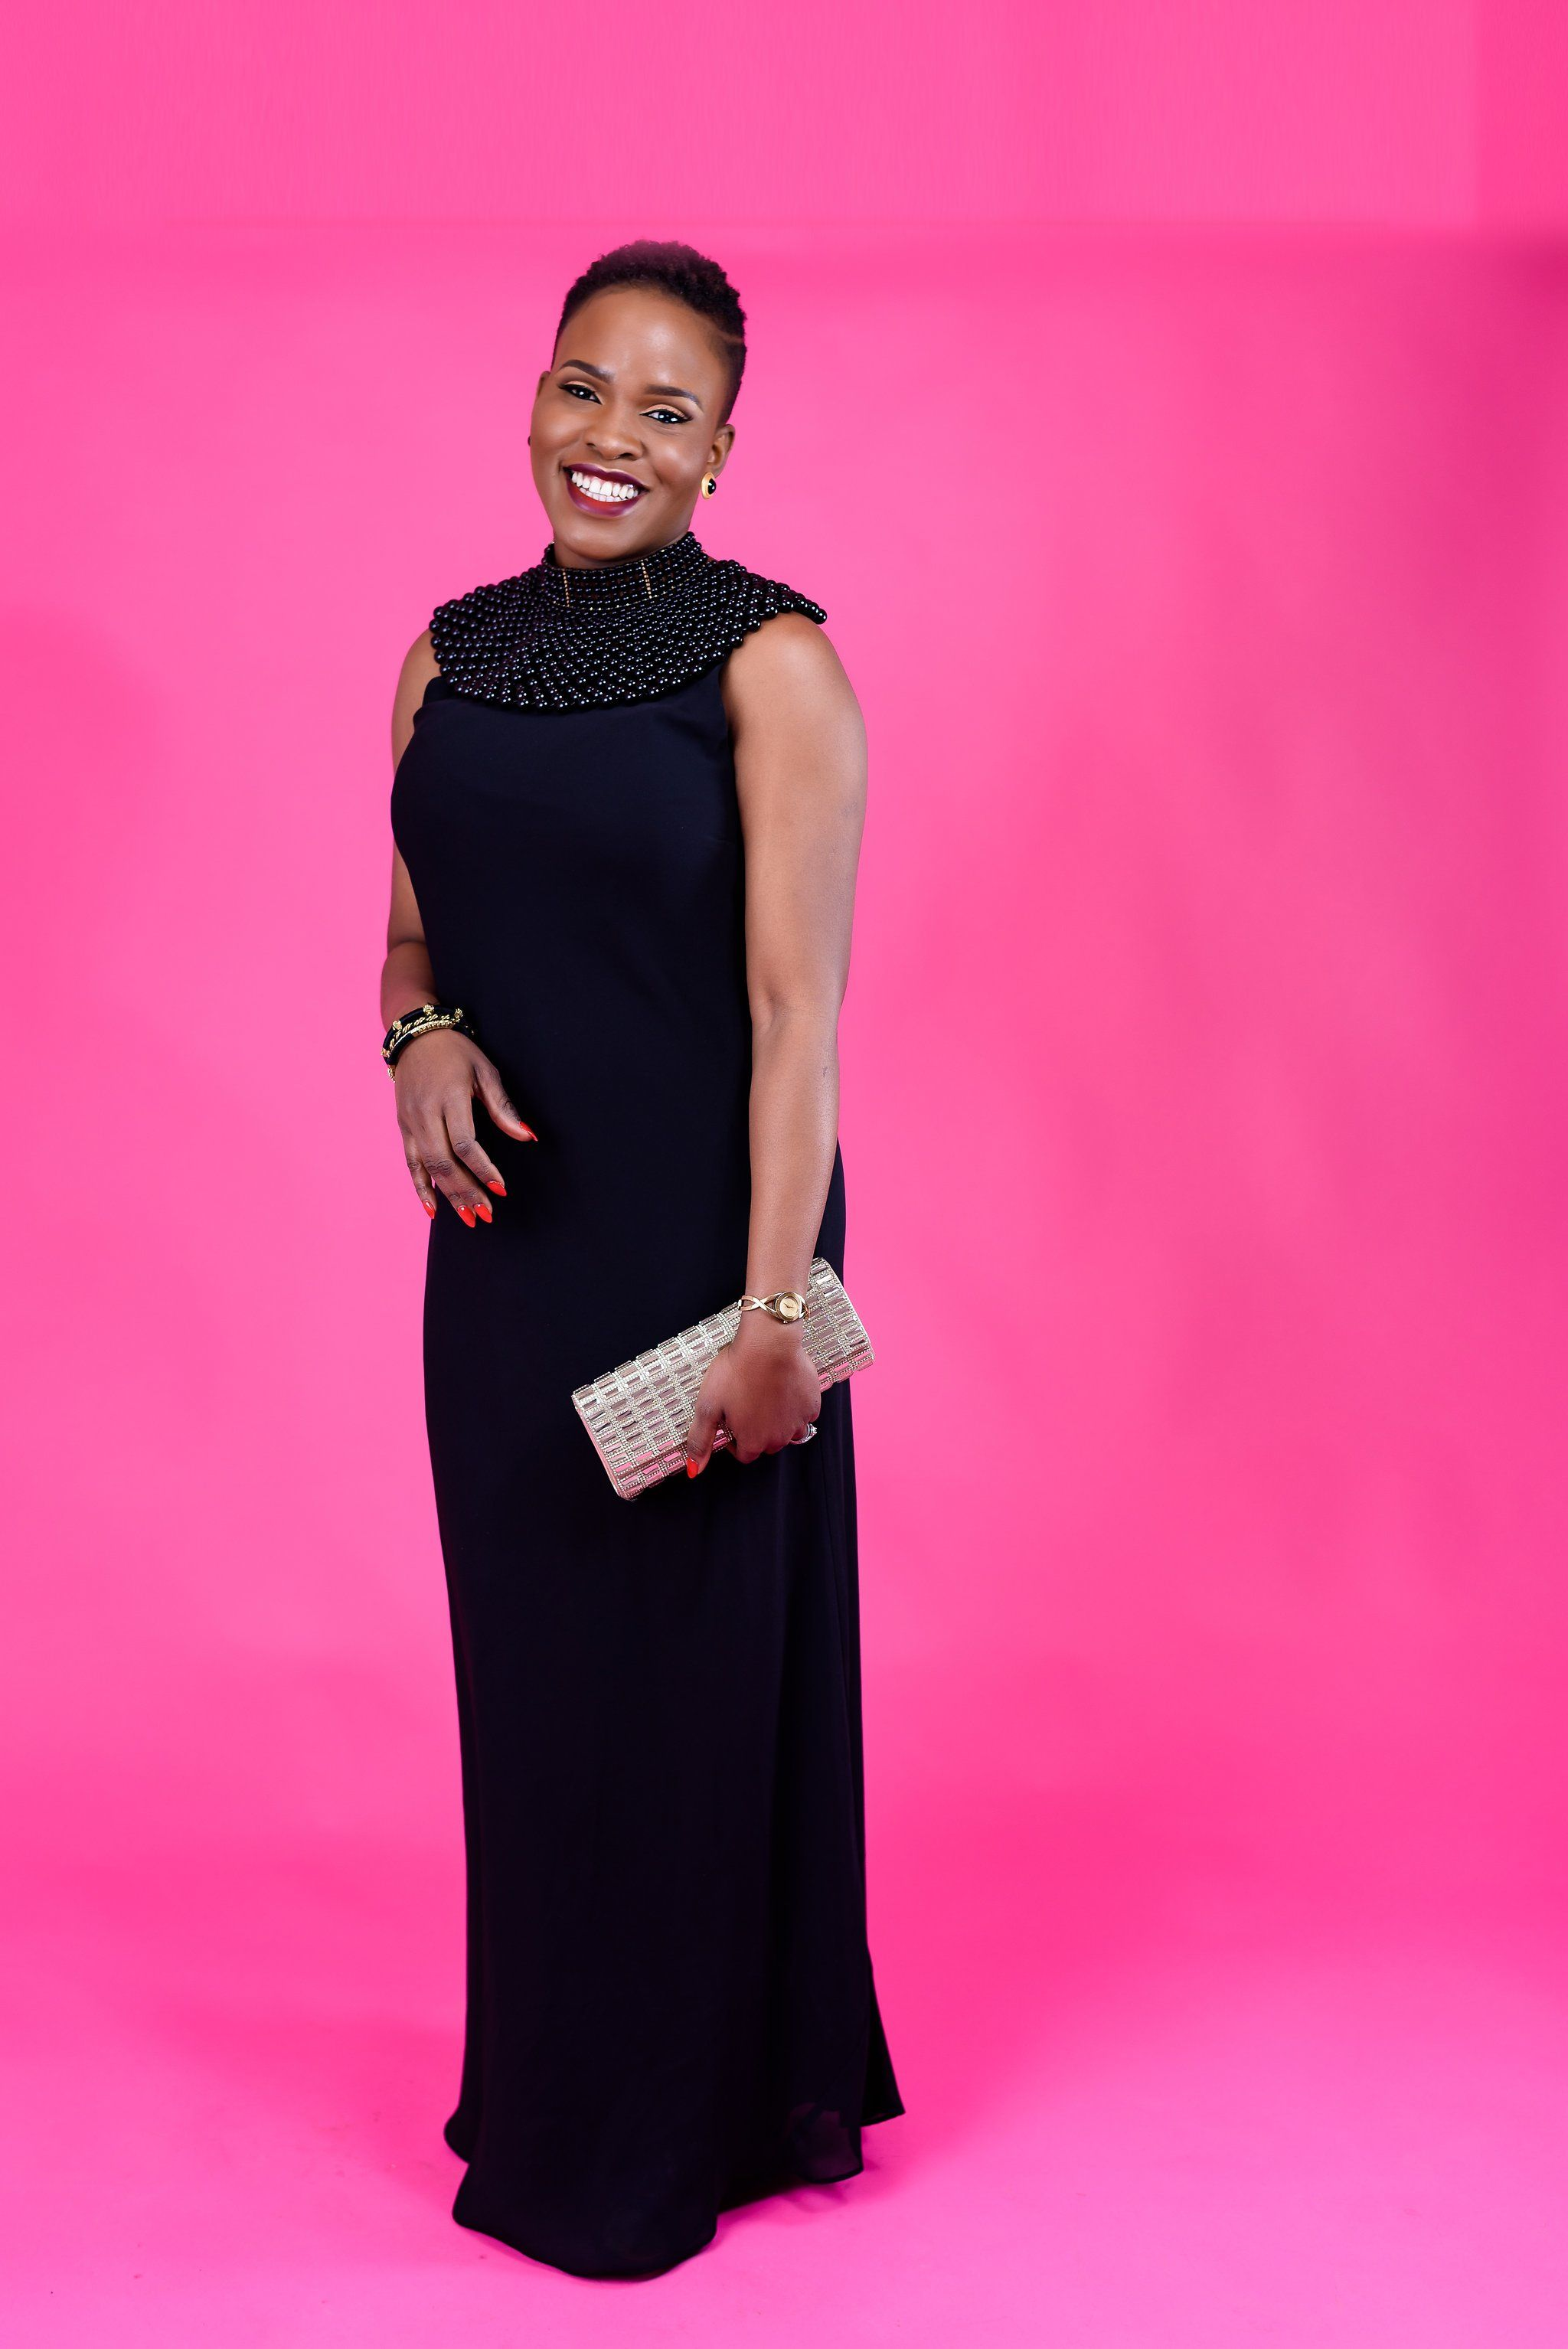 4045dc5e5246 Understanding Dress Codes : Black Tie Events. black tie evening dresses, black  tie attire, black tie event dresses, wedding party guest, wedding guest, ...